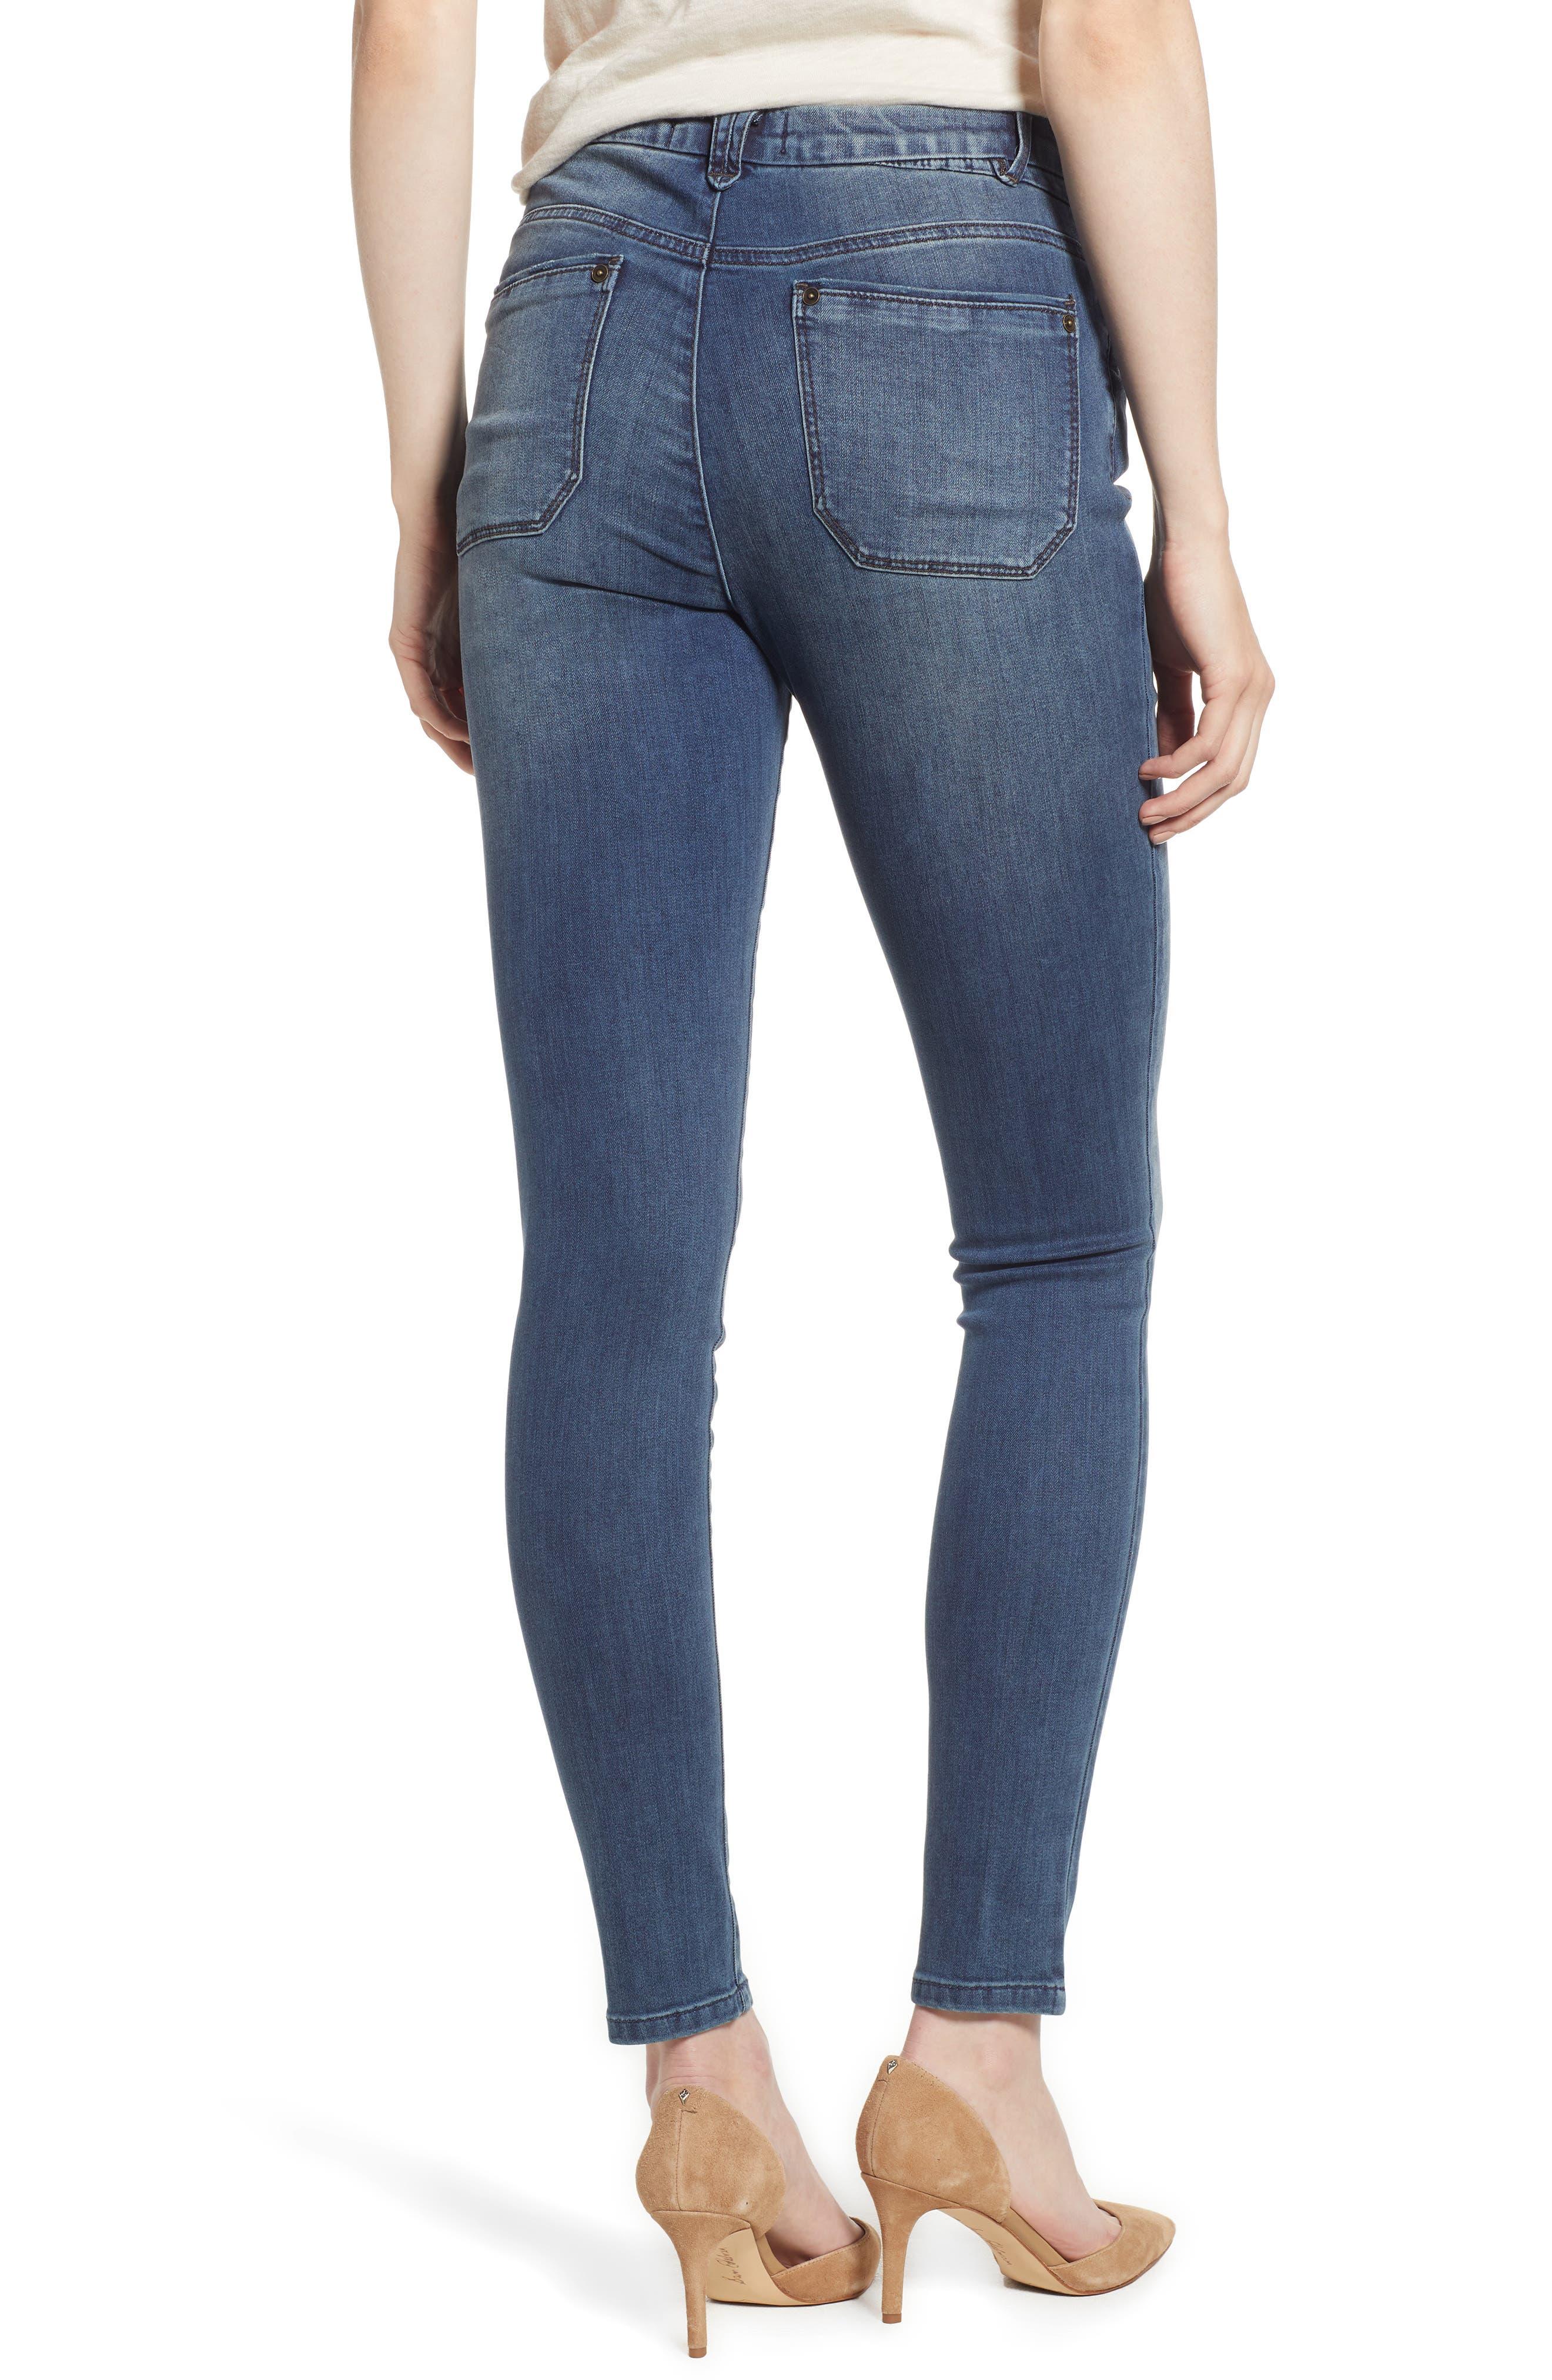 Ab-Solution High Waist Skinny Jeans,                             Alternate thumbnail 2, color,                             420